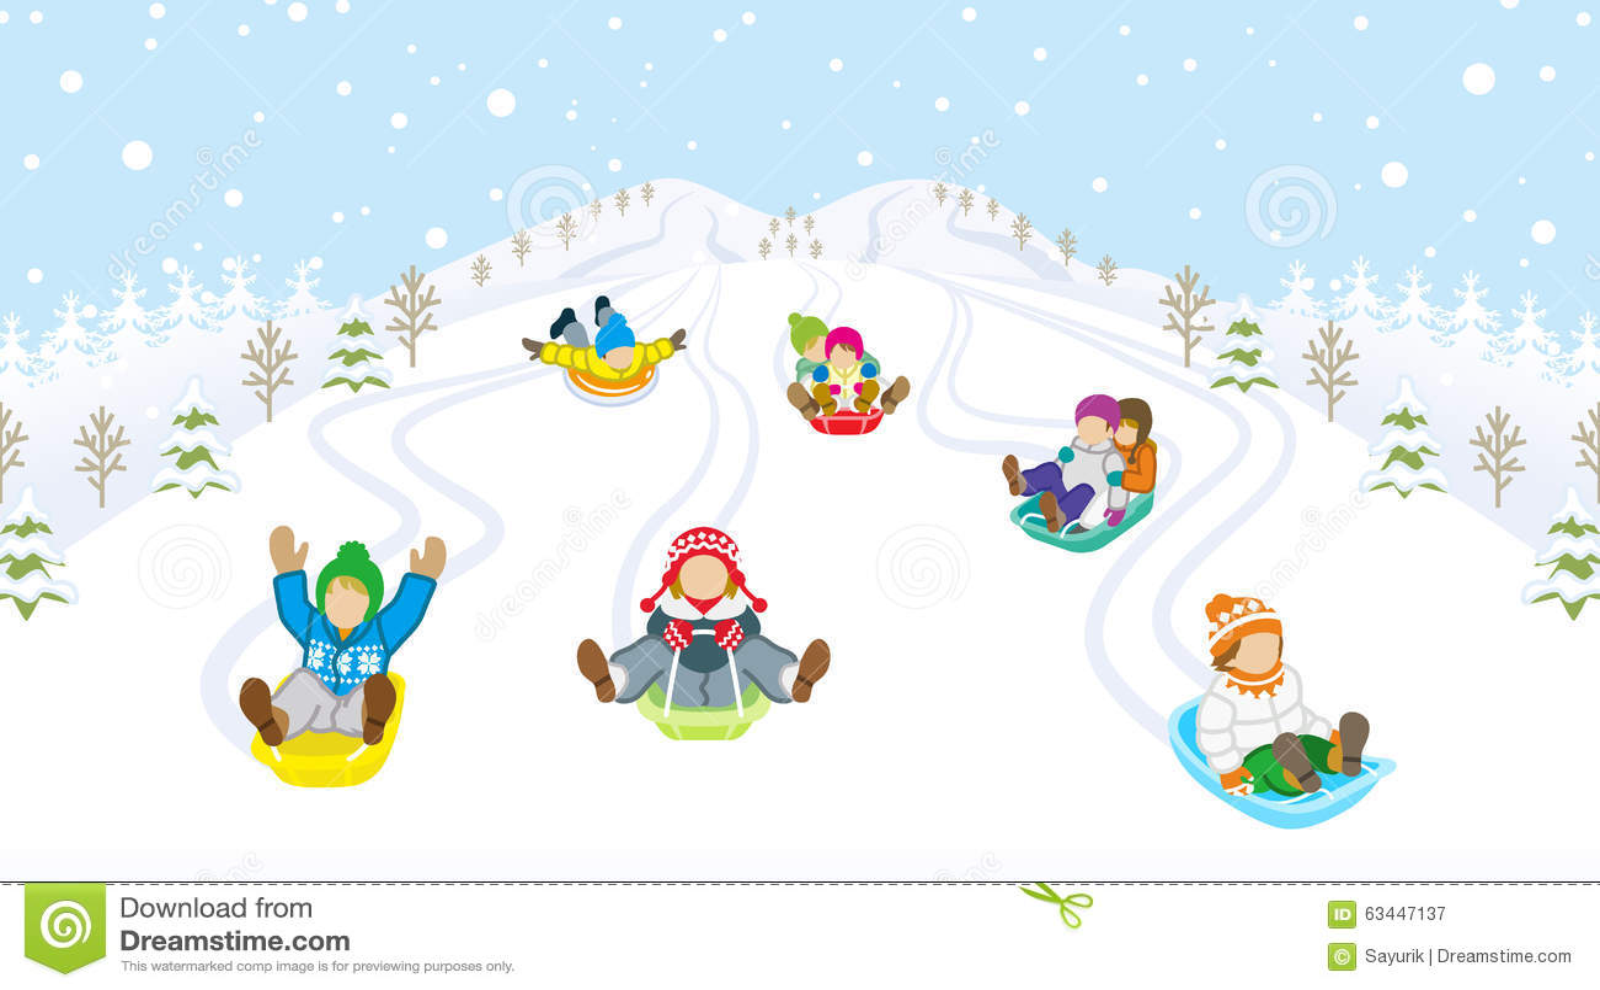 sledding kids in snowy mountain stock vector winter scene clip art black and white winter scenes clipart modern